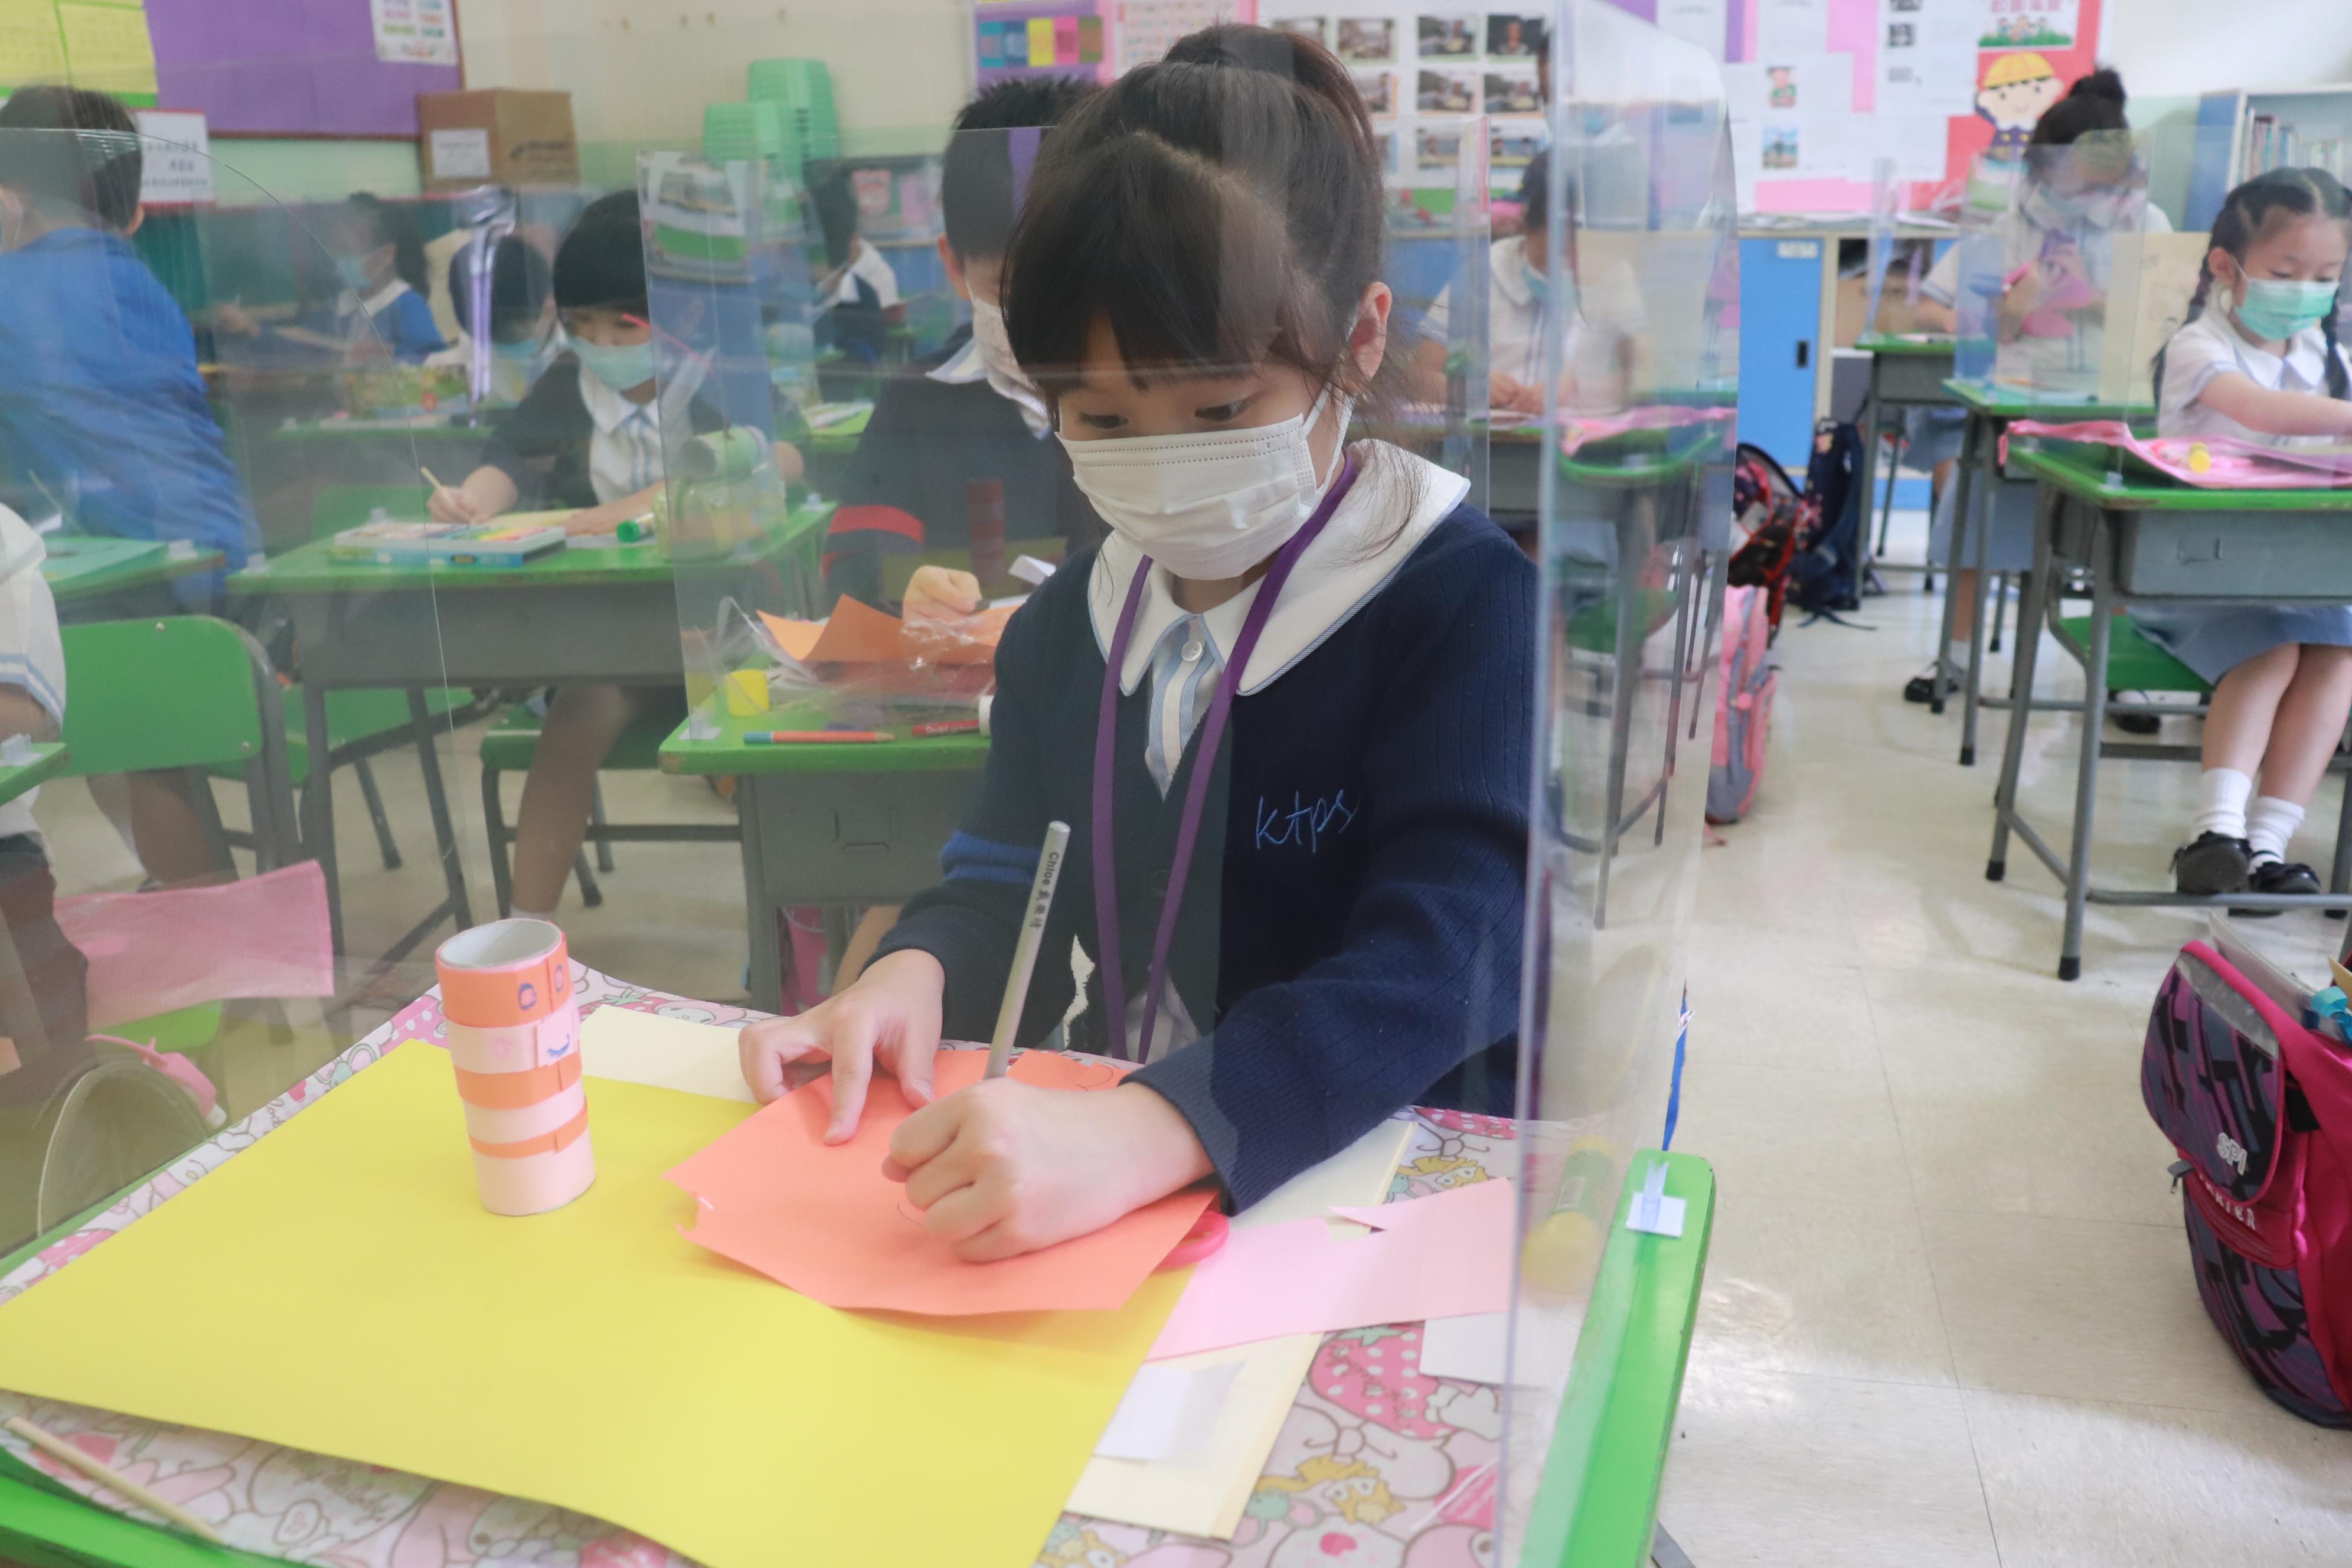 http://keito.school.hk/sites/default/files/img_6760.jpg